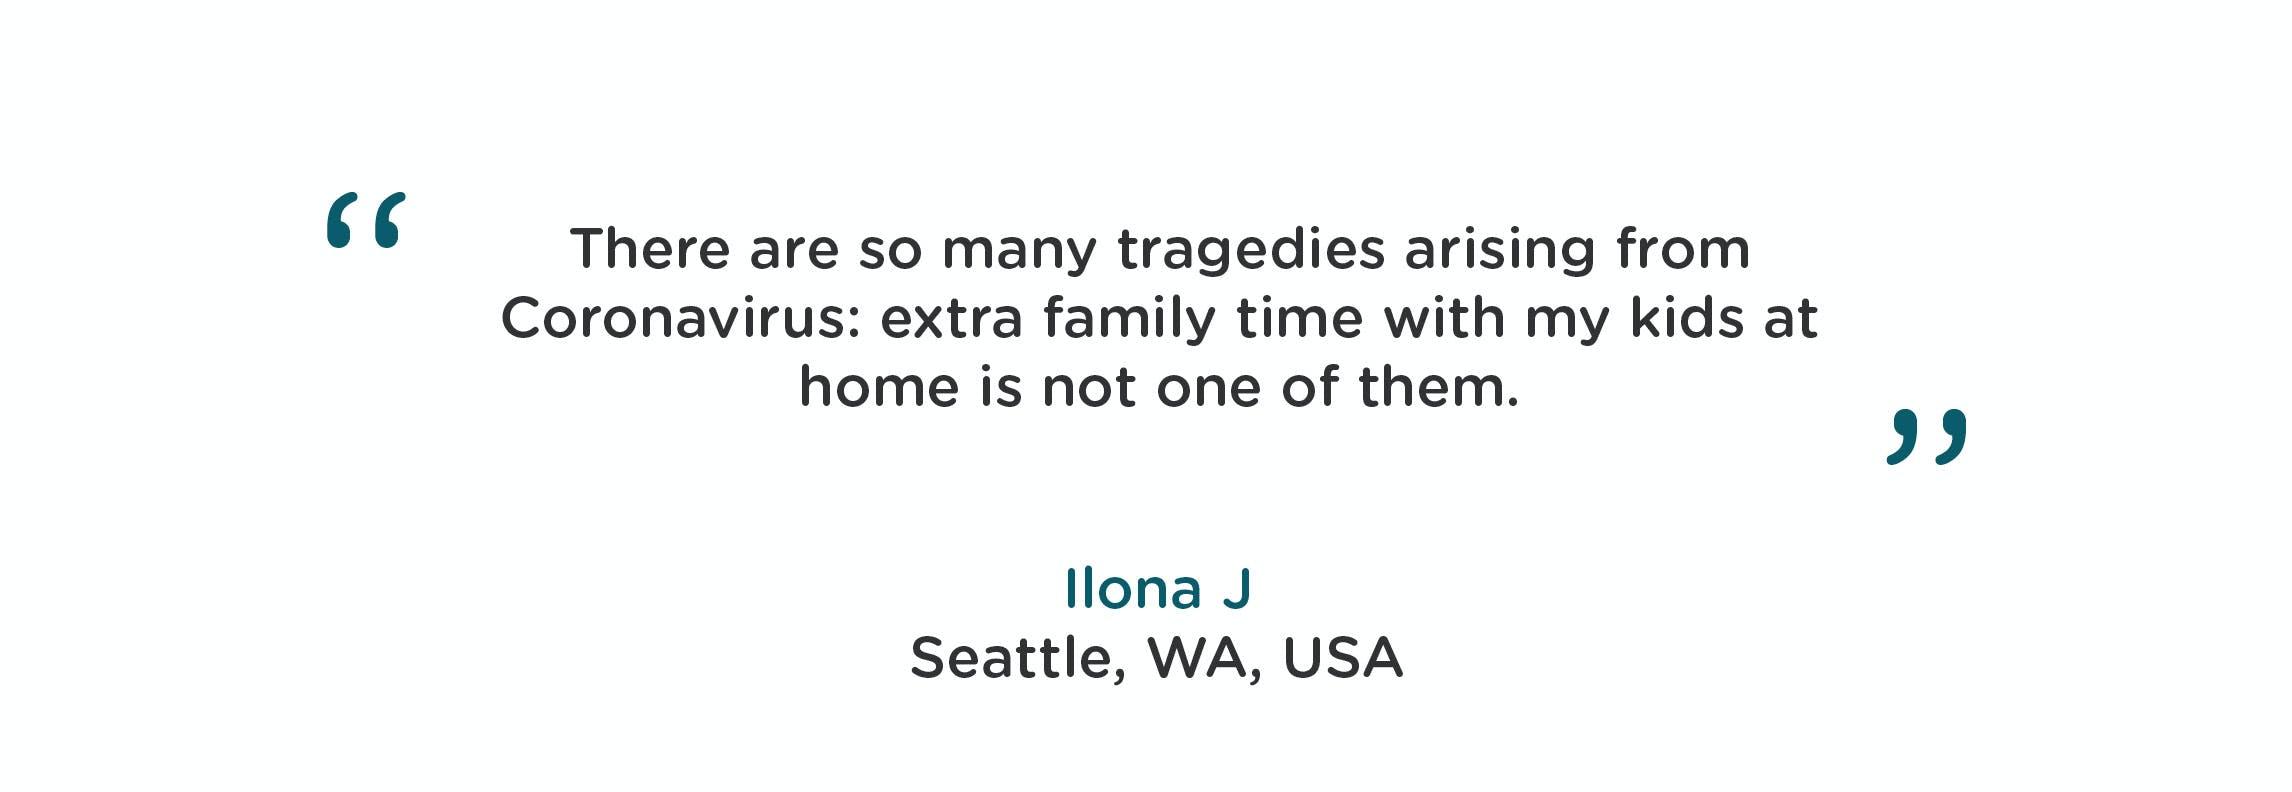 Corona virus quote from Ilona